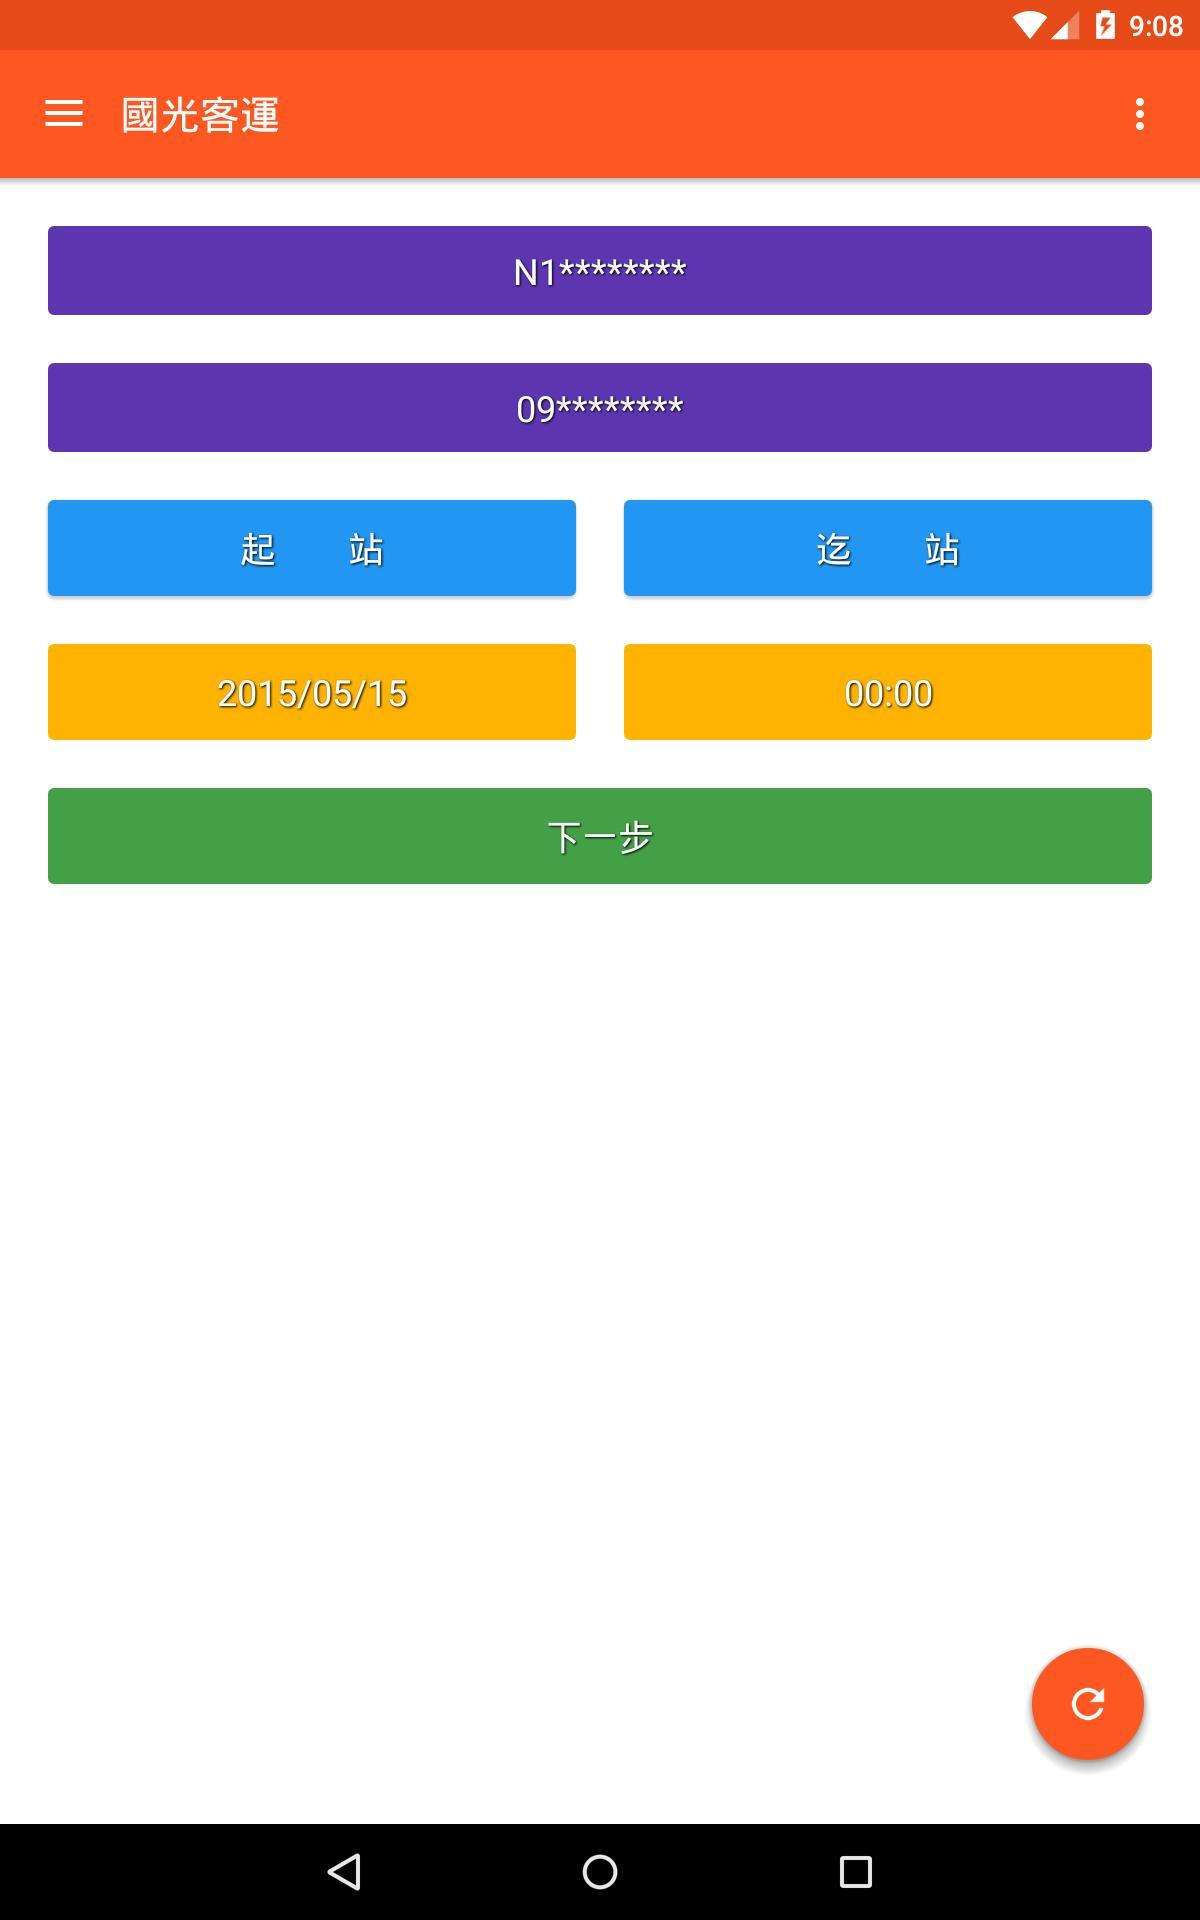 GetTicket (國光/統聯/阿羅哈) poster